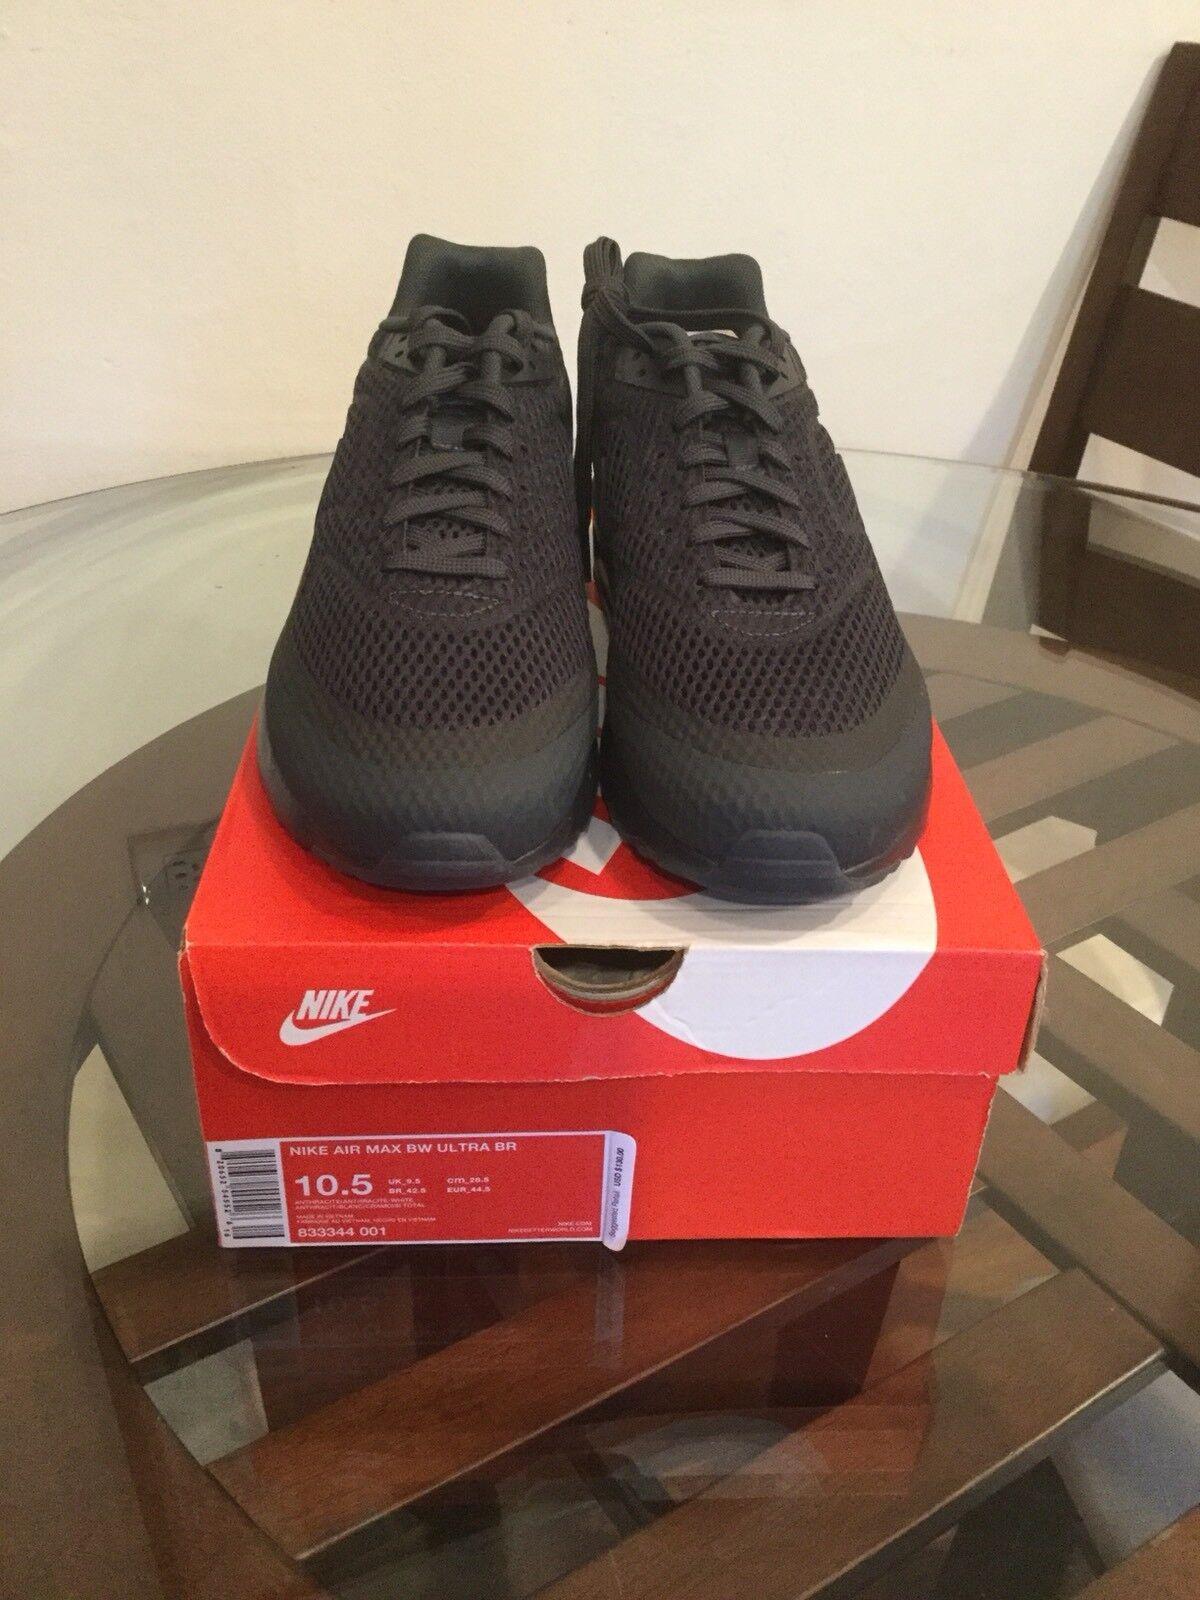 Nike air max kg ultra atmen br atmen ultra anthrazit - schwarz 833344-001 10,5 4042e4